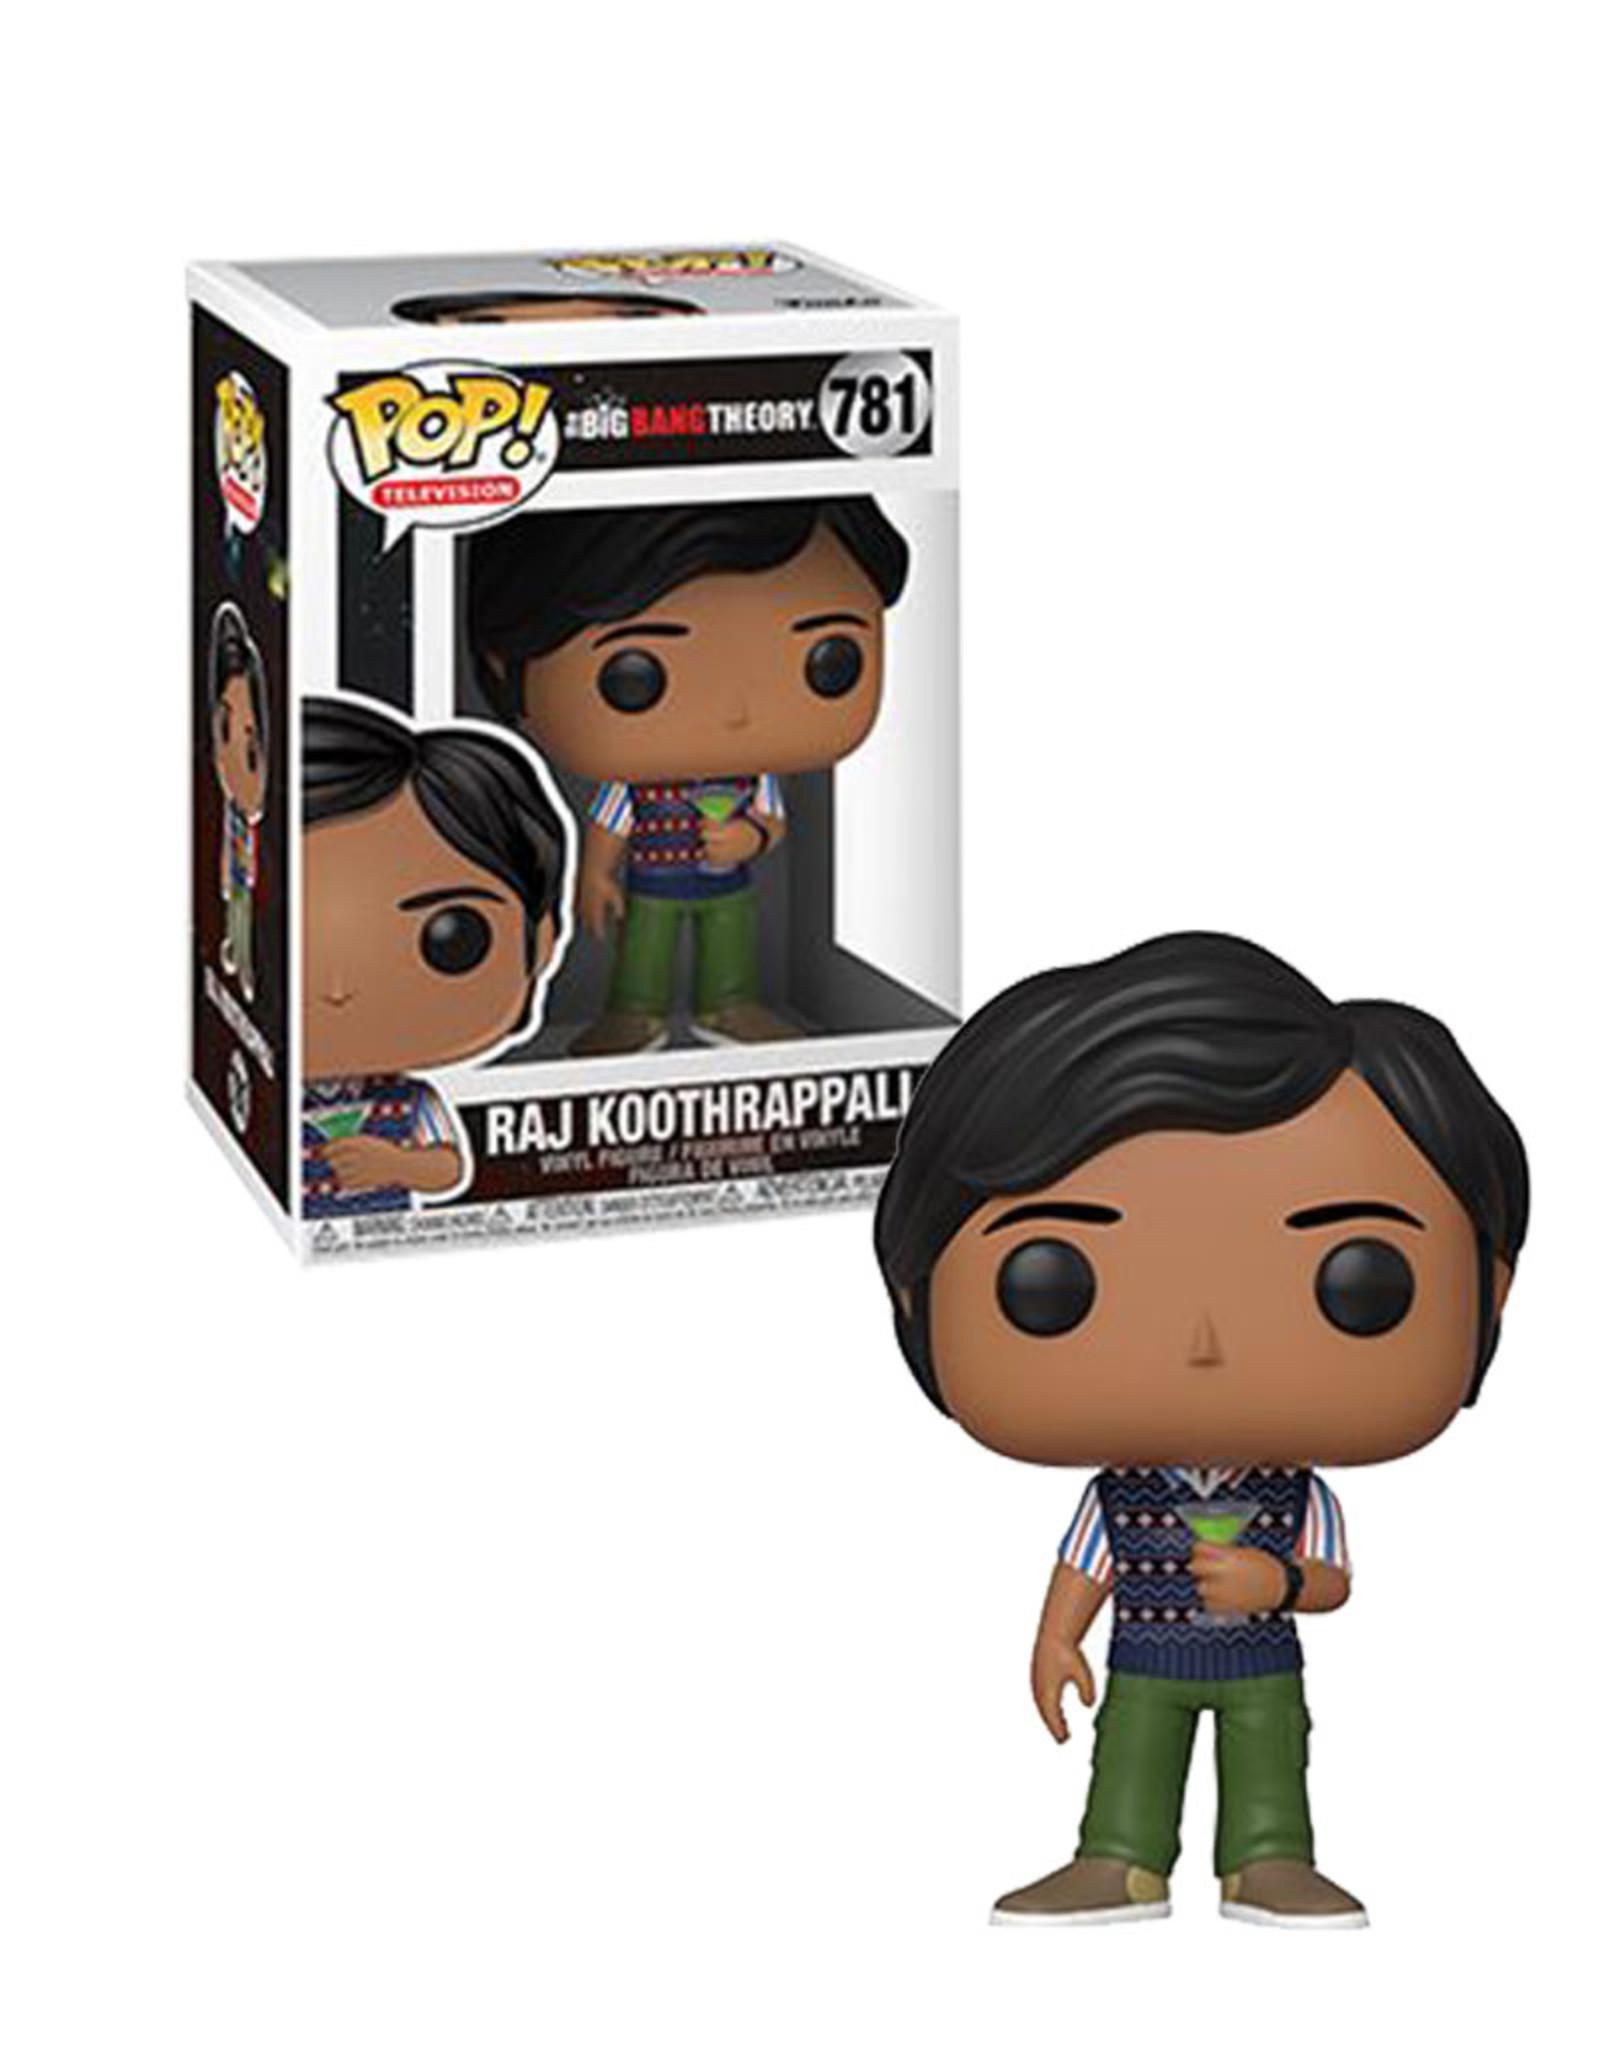 Raj Koothrappali 781 ( Funko Pop ) The Big Bang Theory